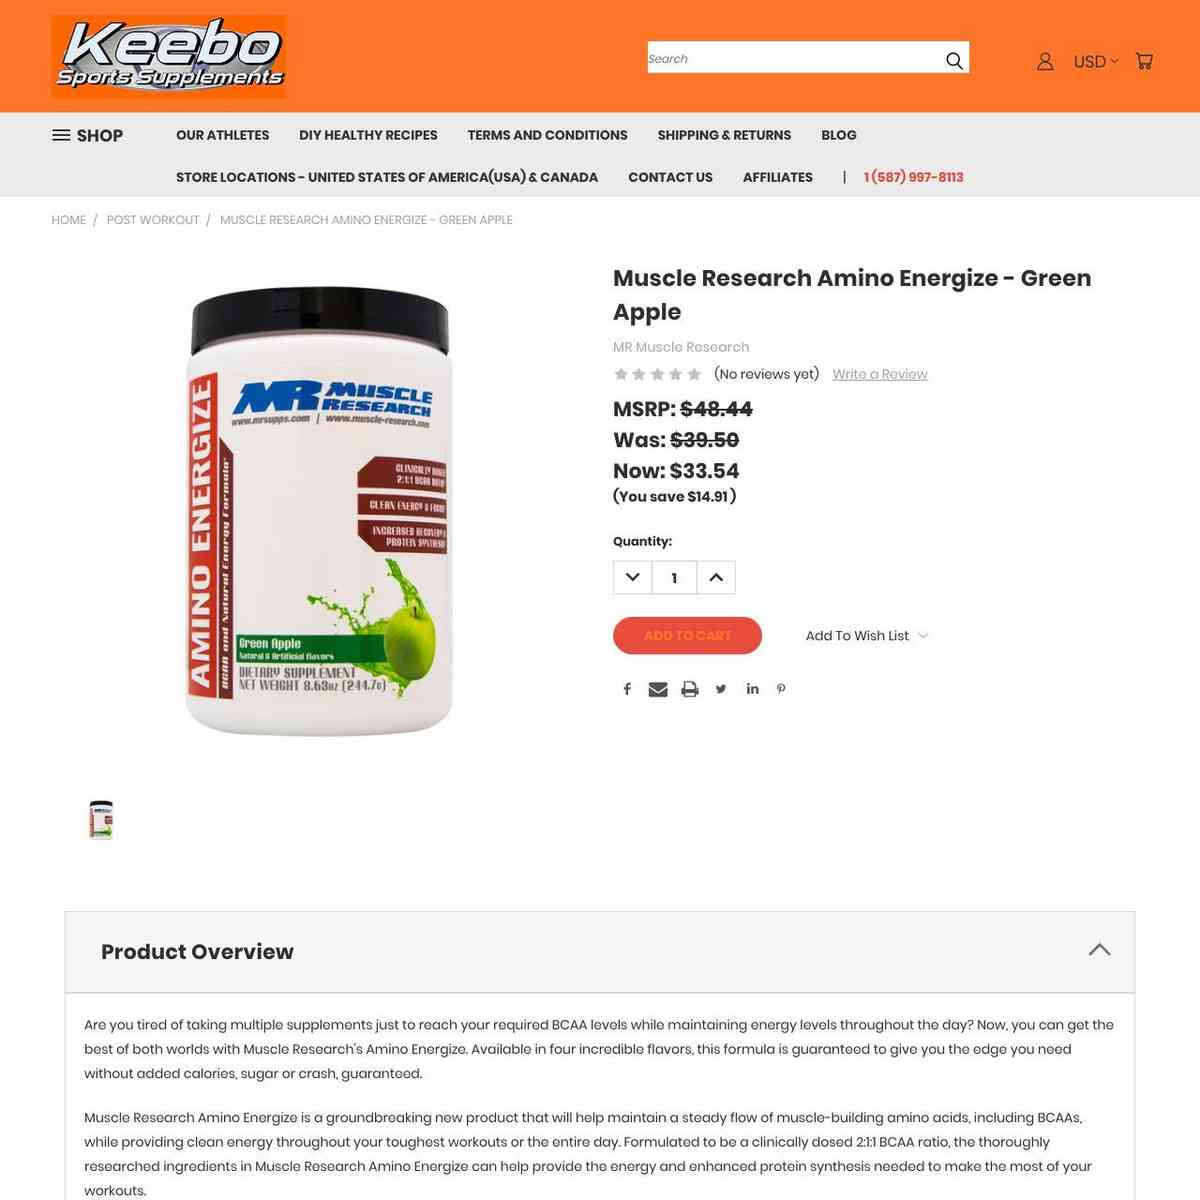 https://www.keebosportssupplements.com/muscle-research-amino-energize-green-apple/